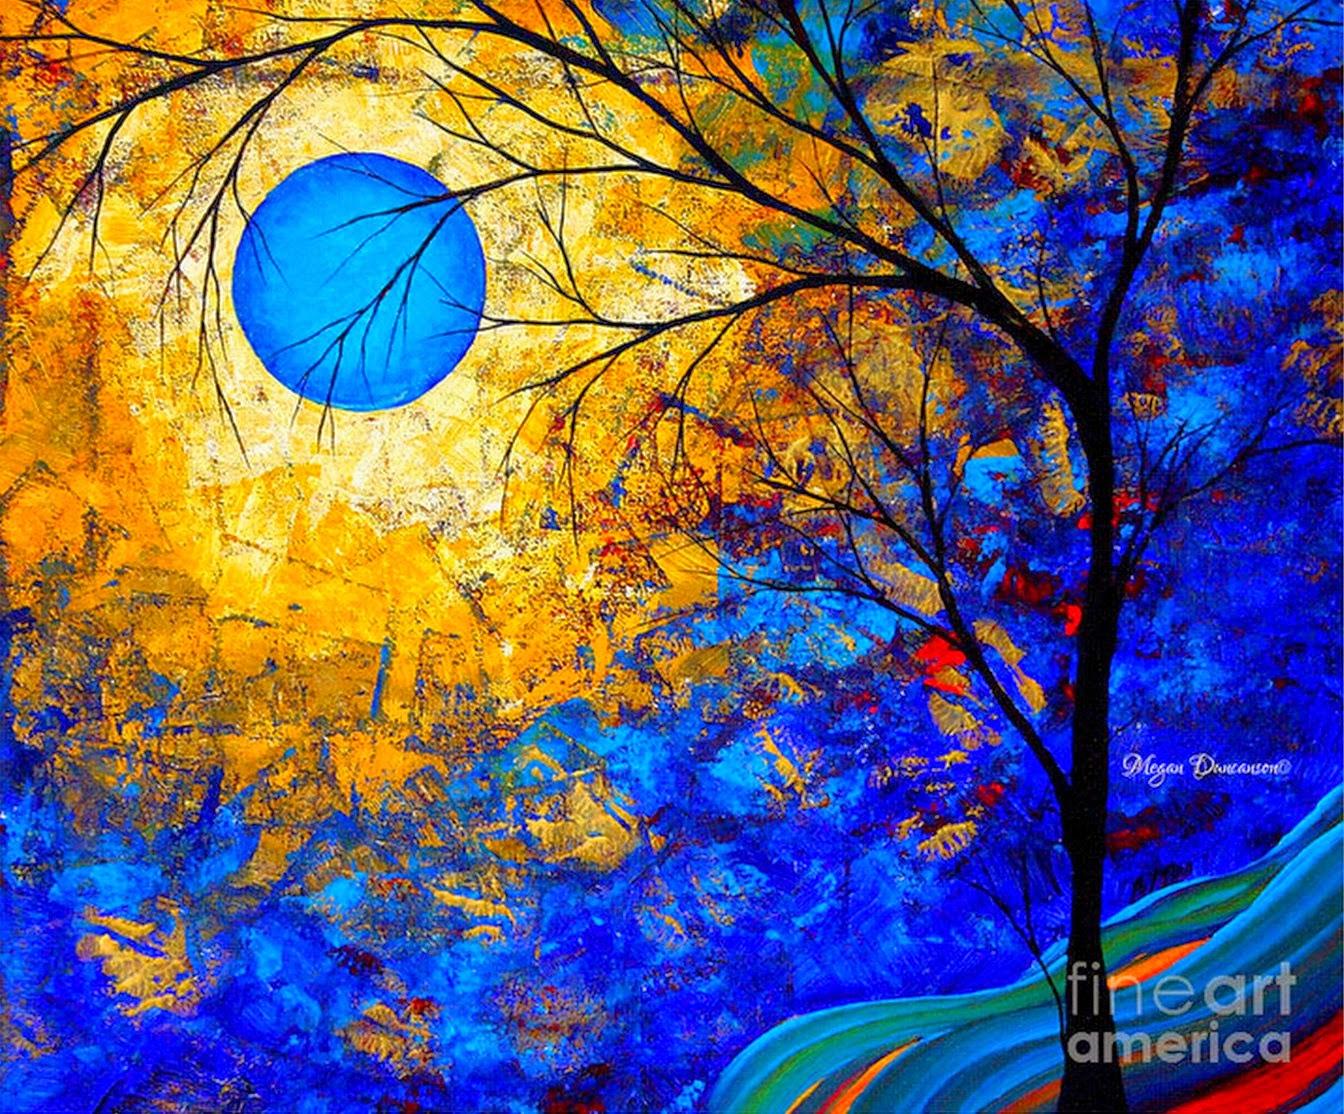 Pintura moderna y fotograf a art stica dibujos f ciles - Imagenes para cuadros ...